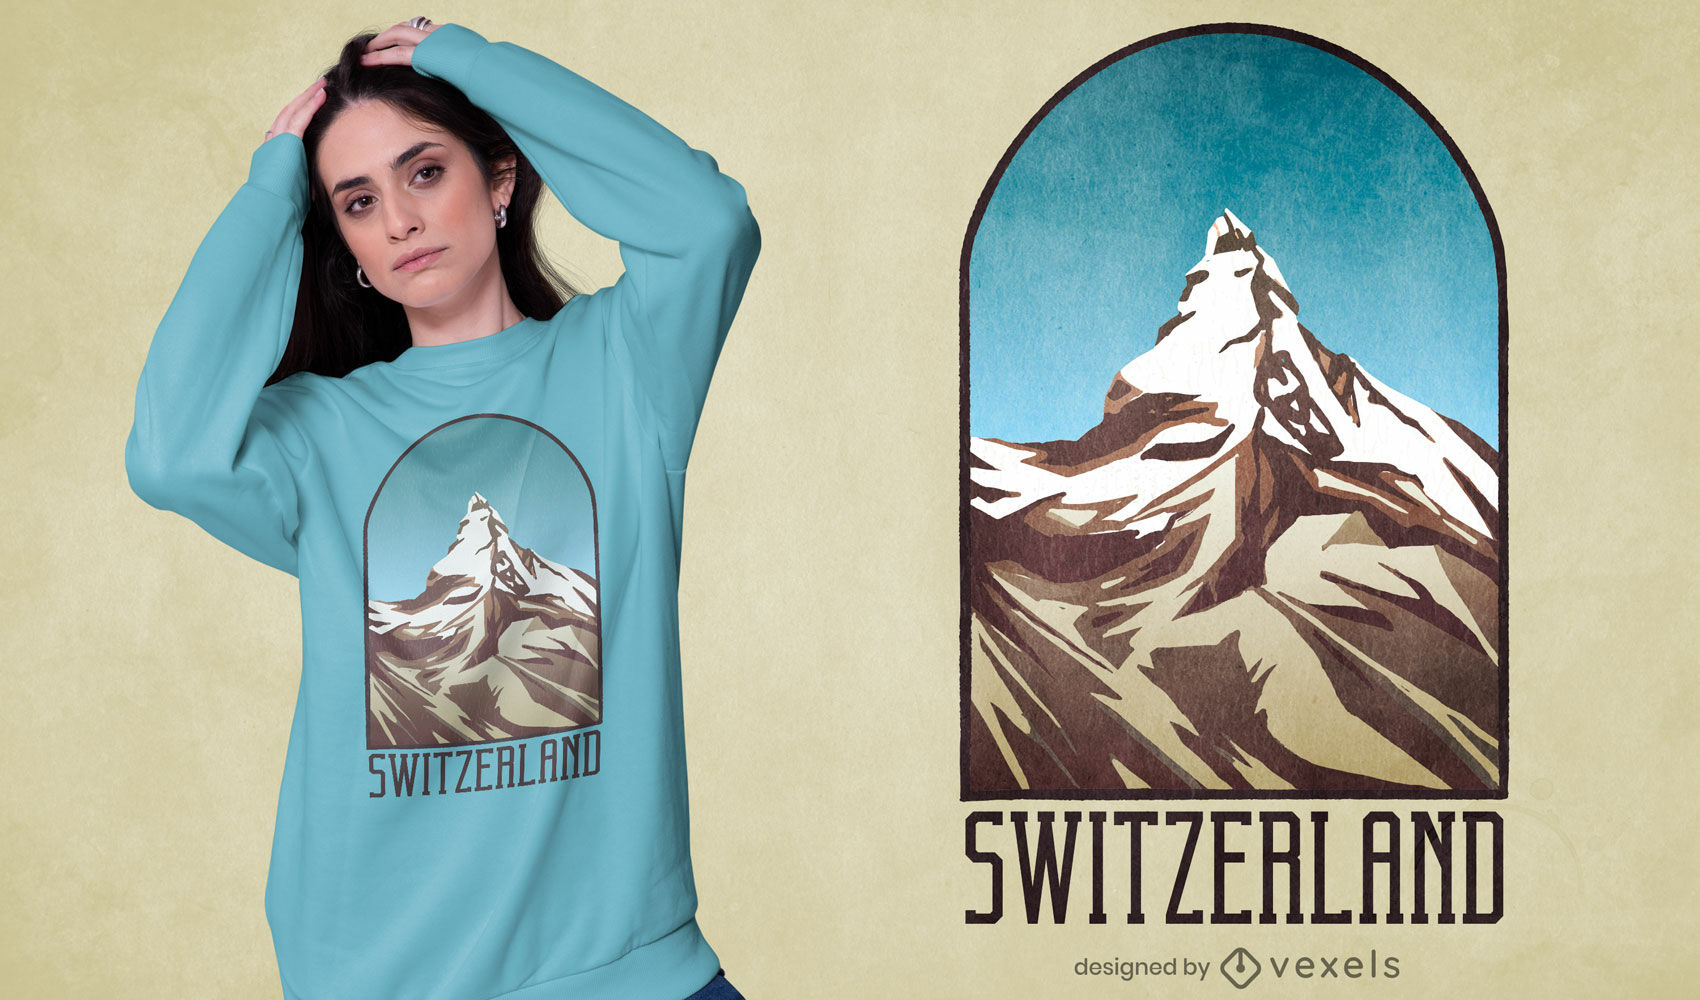 Switzerland mountain textured t-shirt design